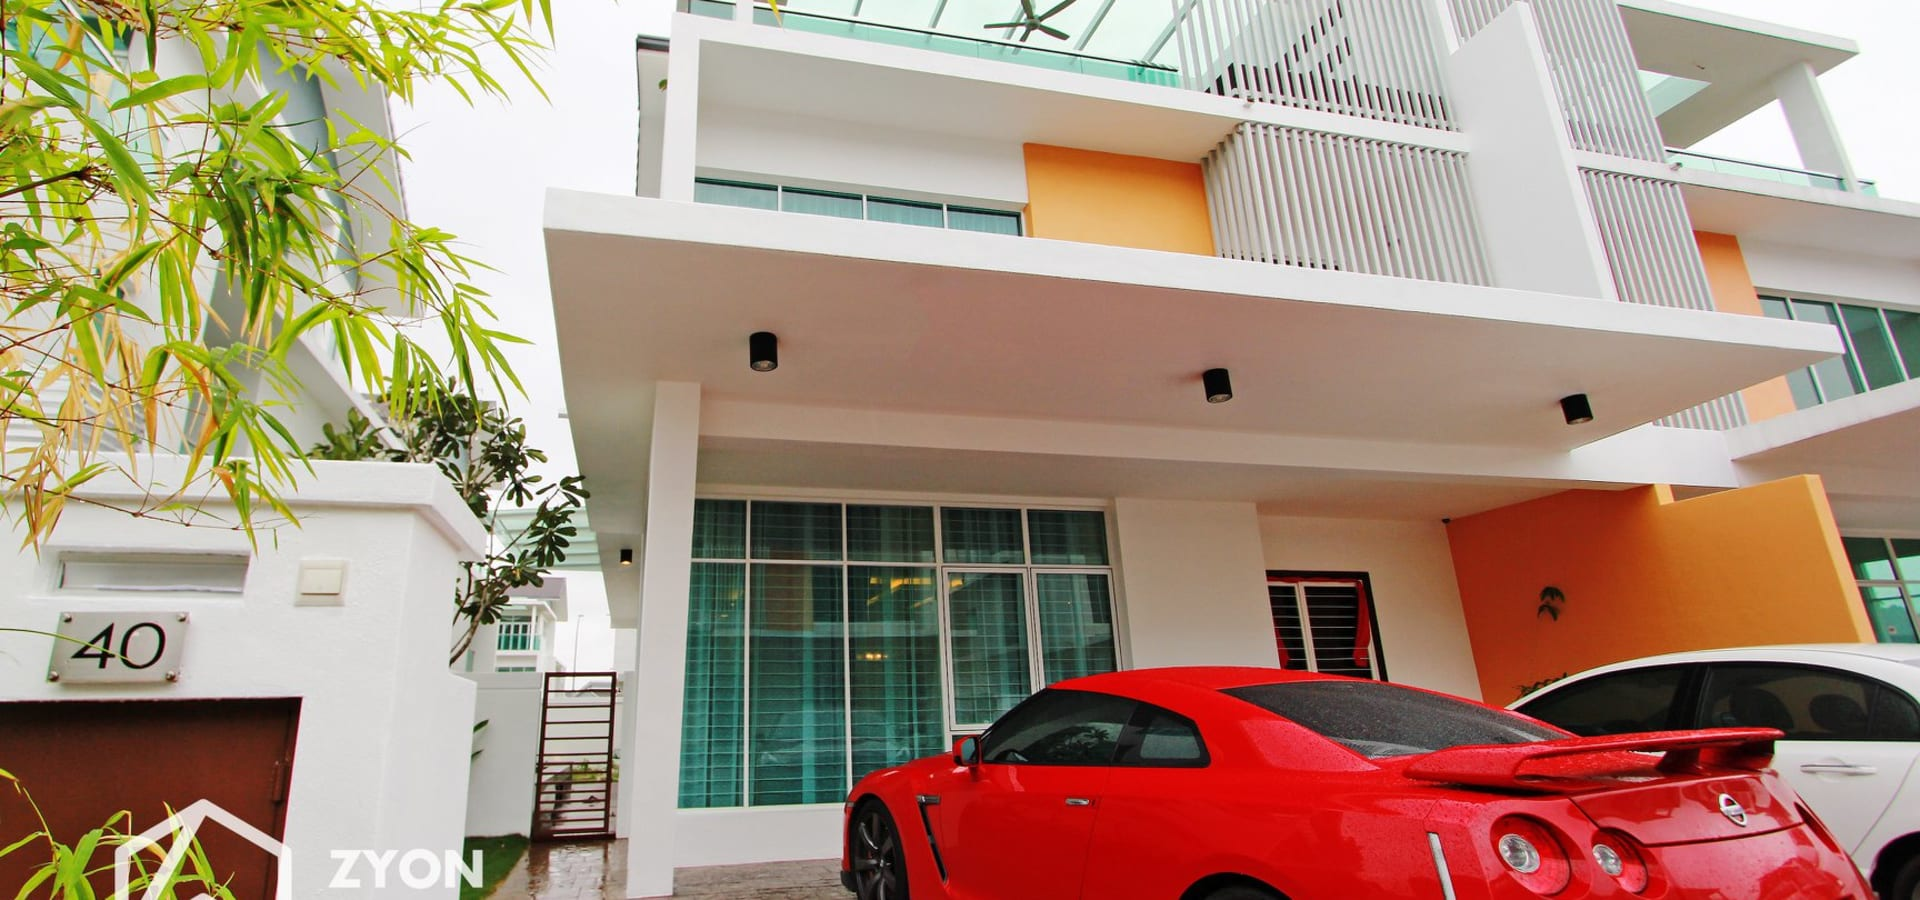 ZYON STUDIO SDN BHD(fka zyon interior design sdn bhd)